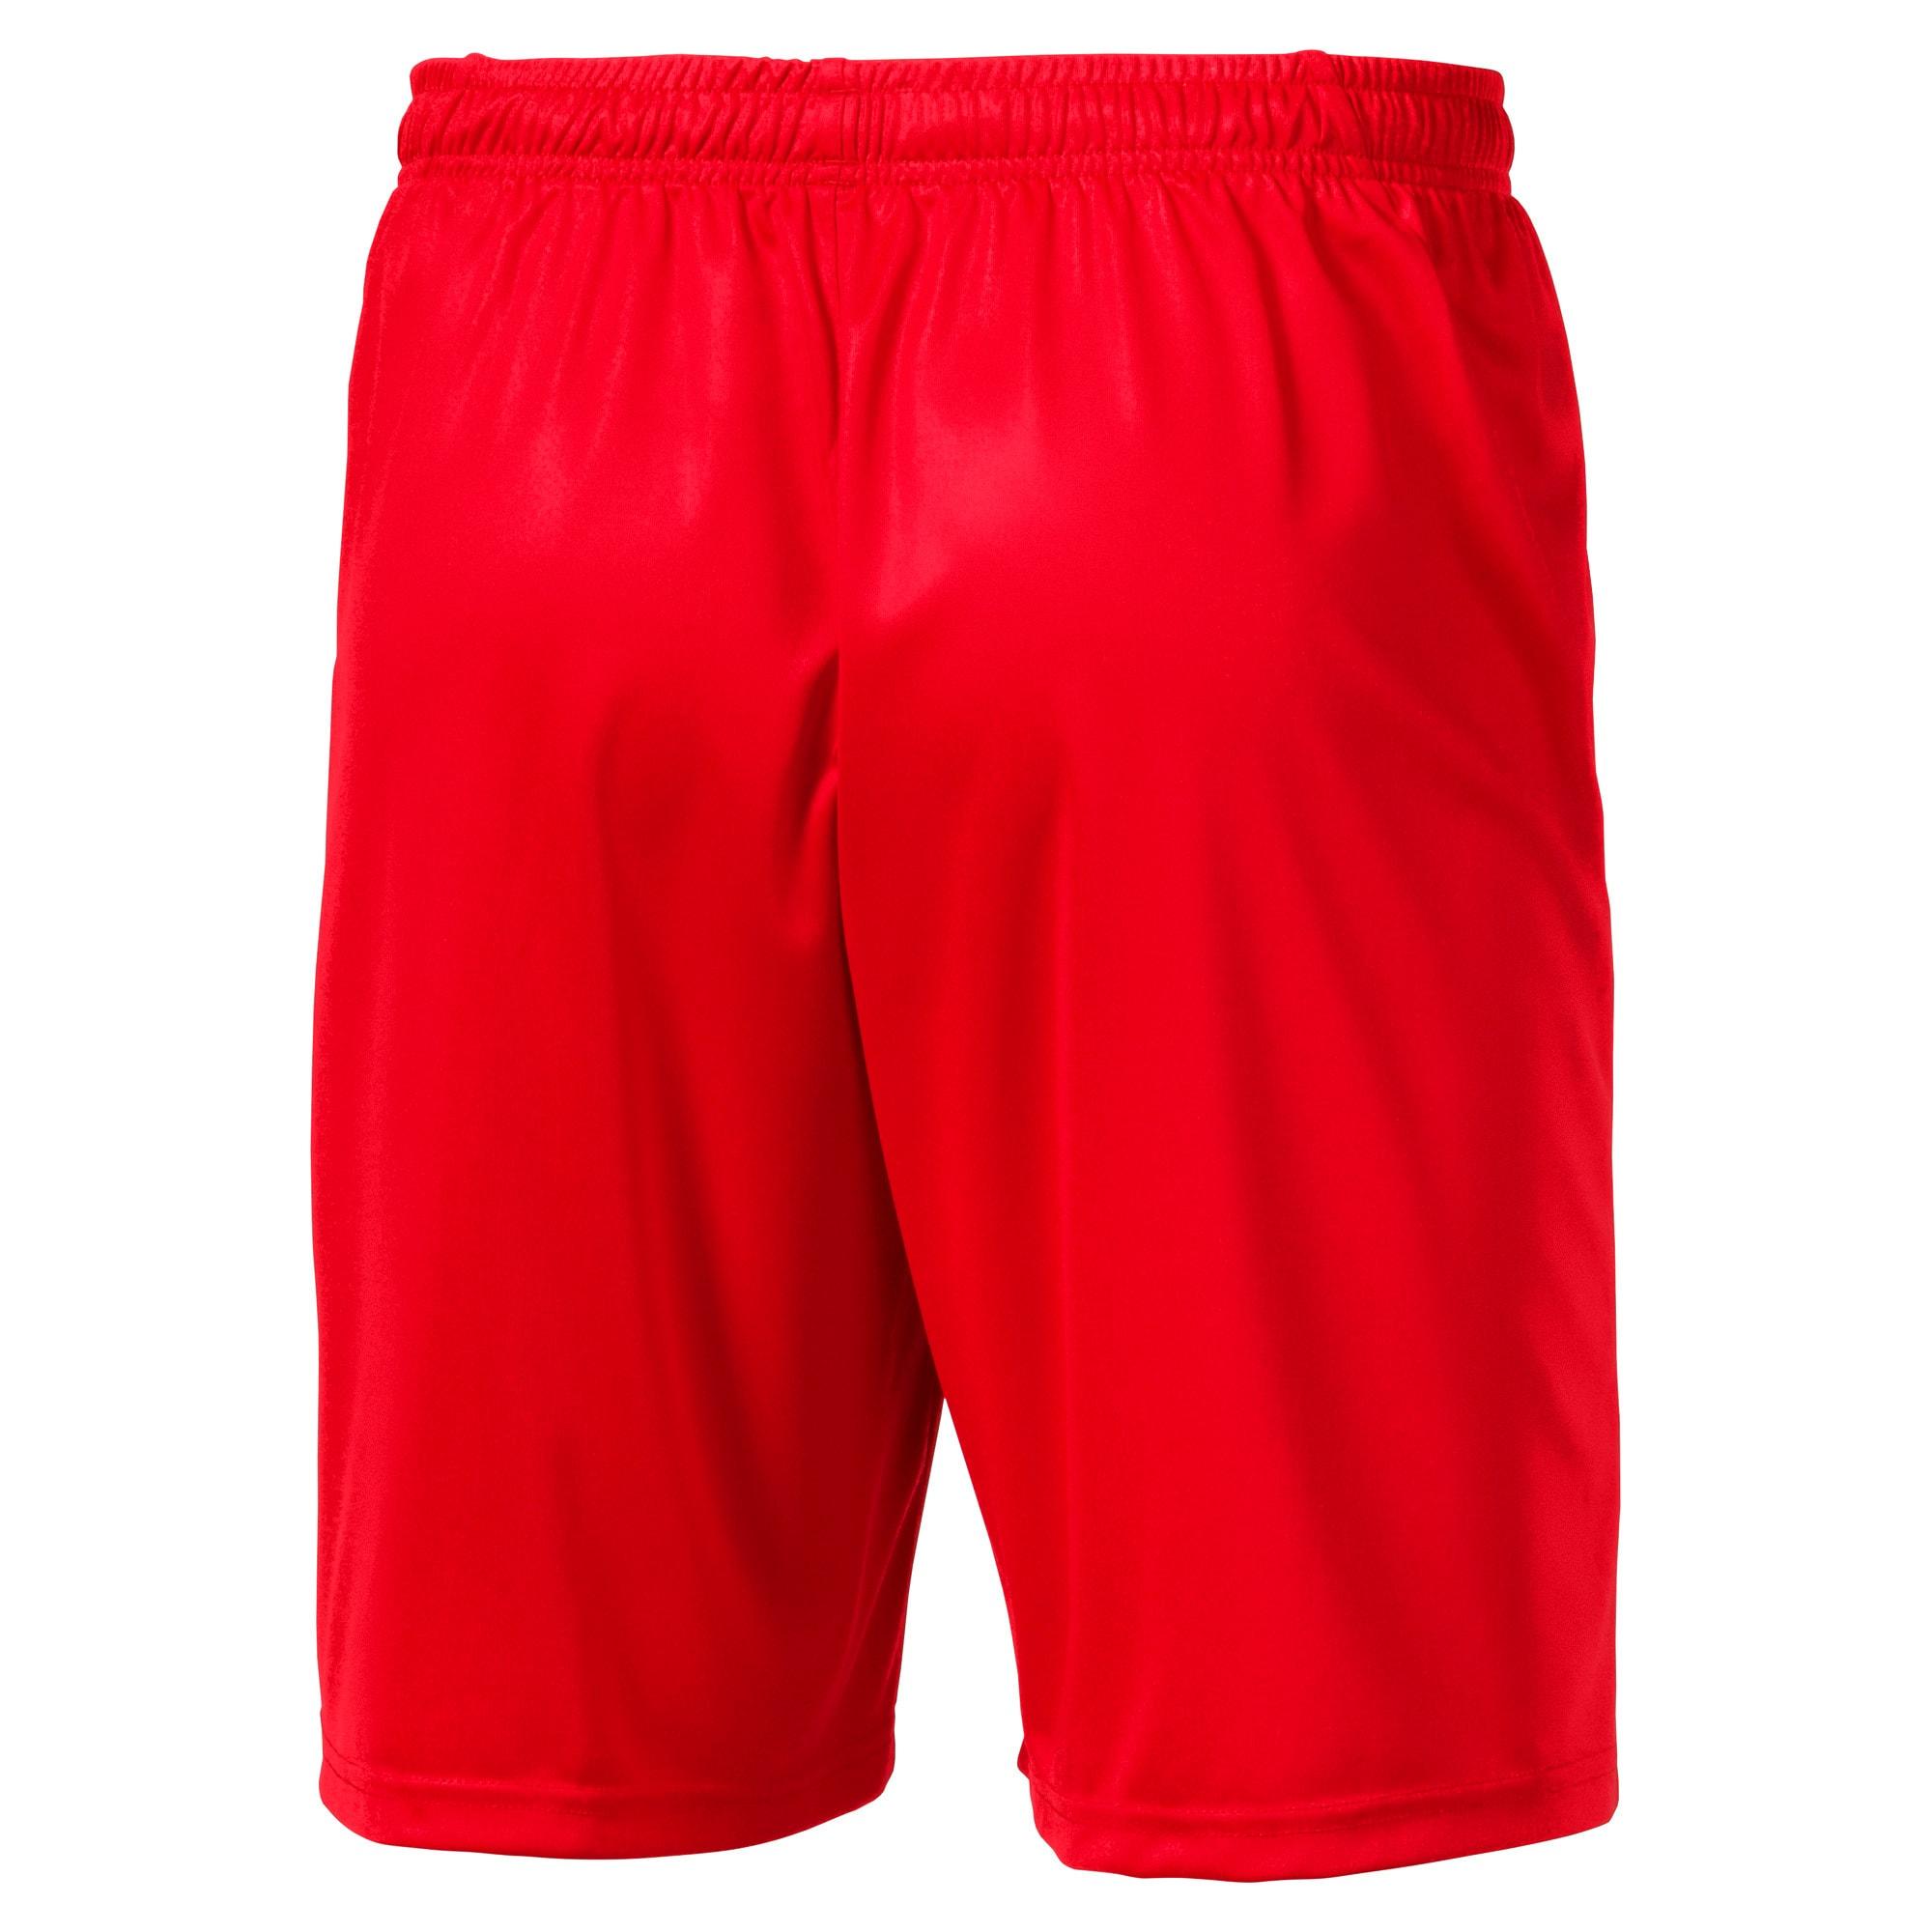 Thumbnail 5 of Liga Core Men's Shorts, Puma Red-Puma White, medium